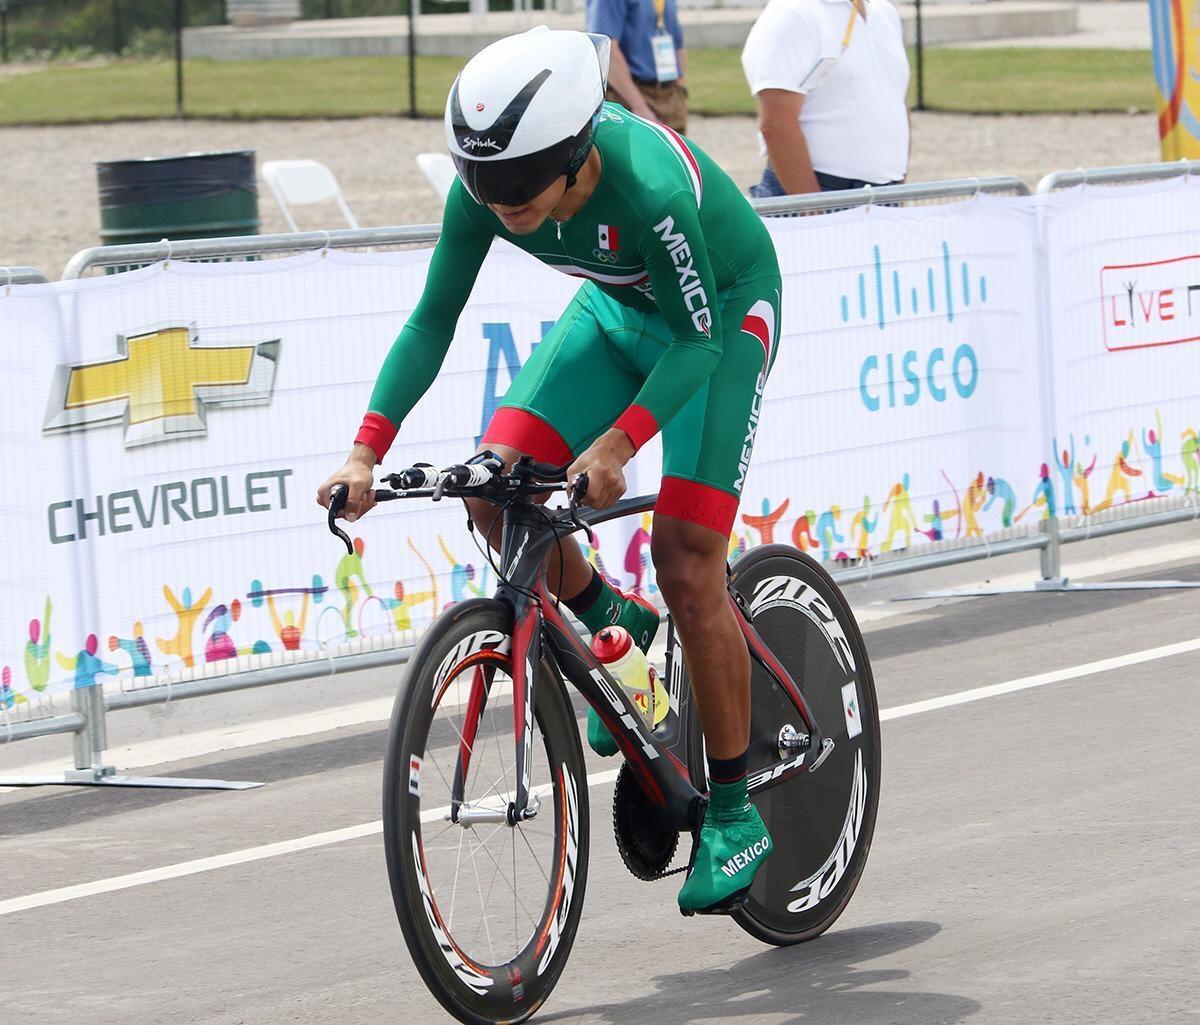 /cms/uploads/image/file/505616/ciclismo_3.jpg